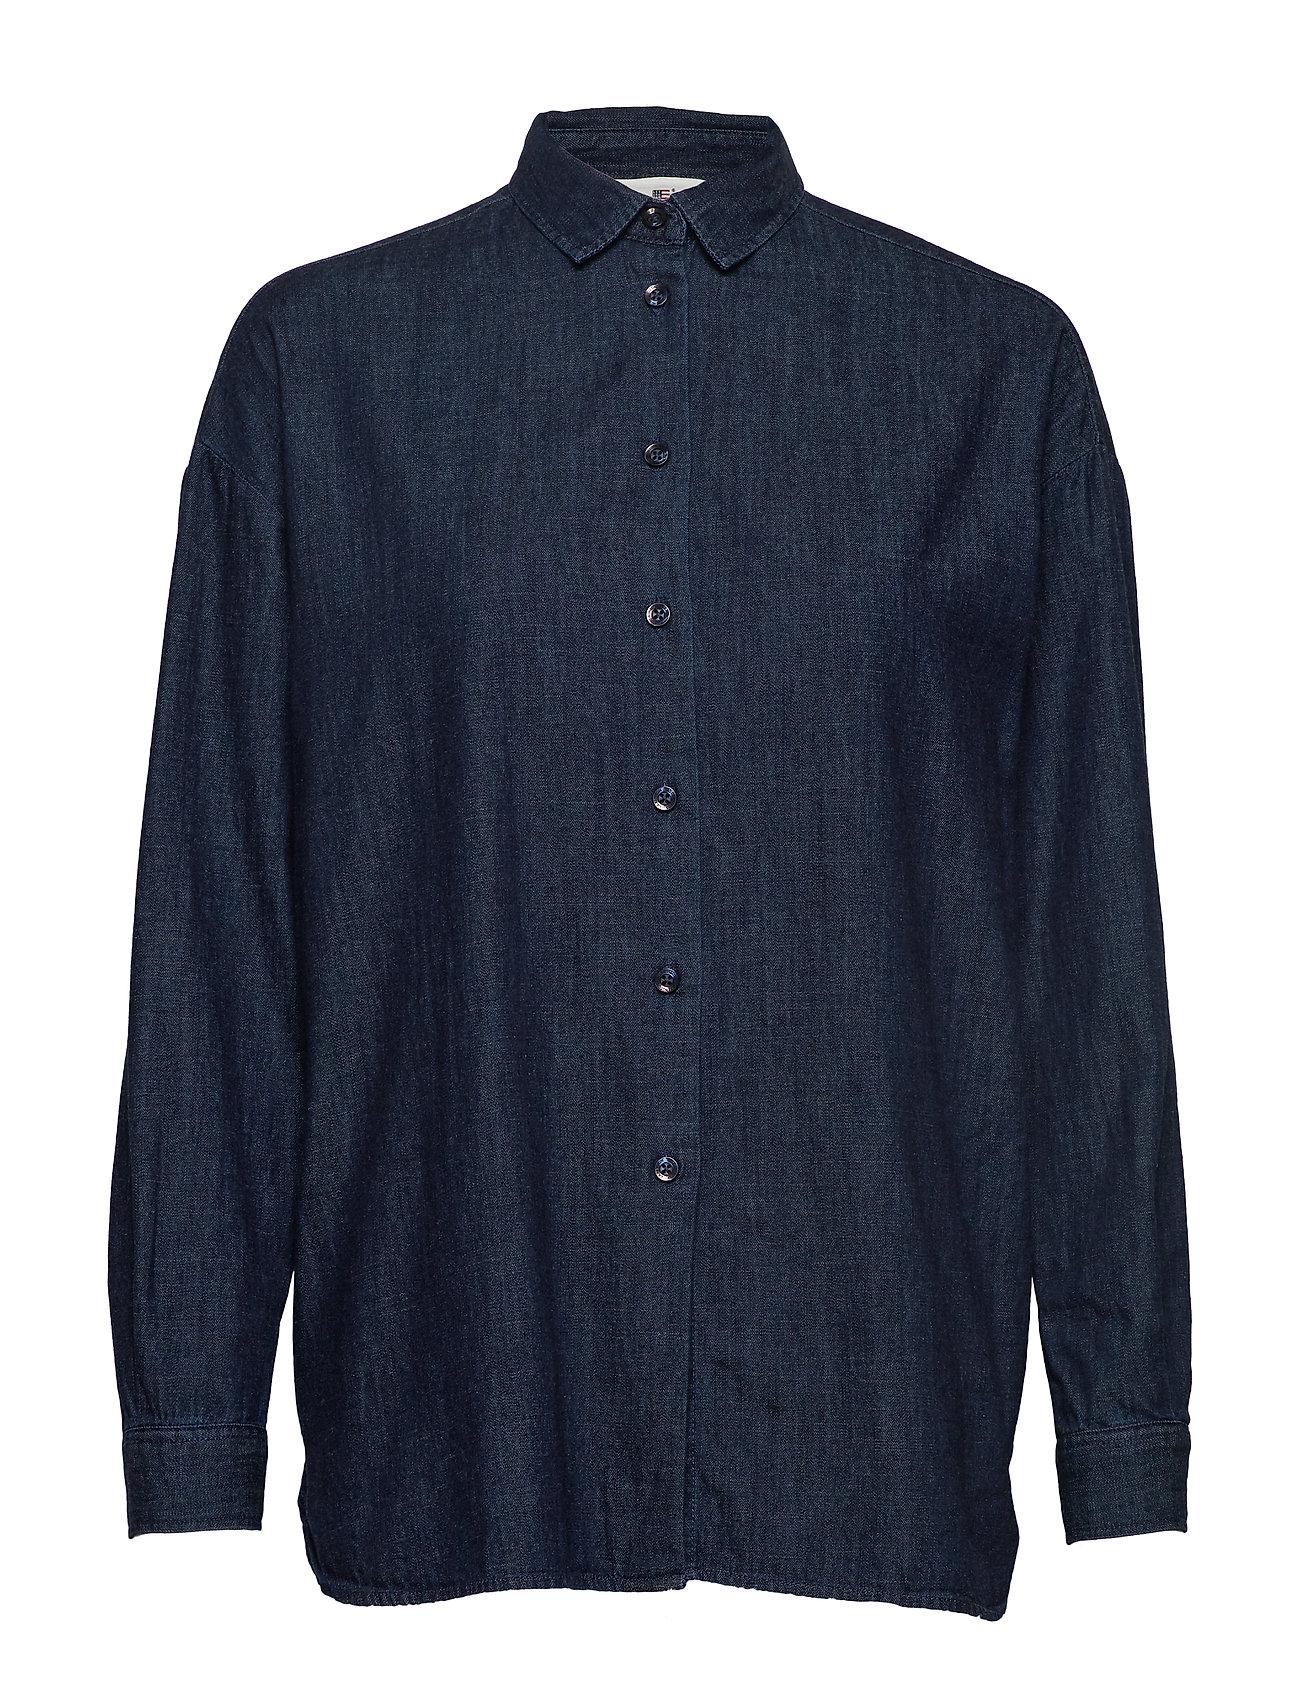 Lexington Clothing Edith Denim Shirt - DARK BLUE DENIM